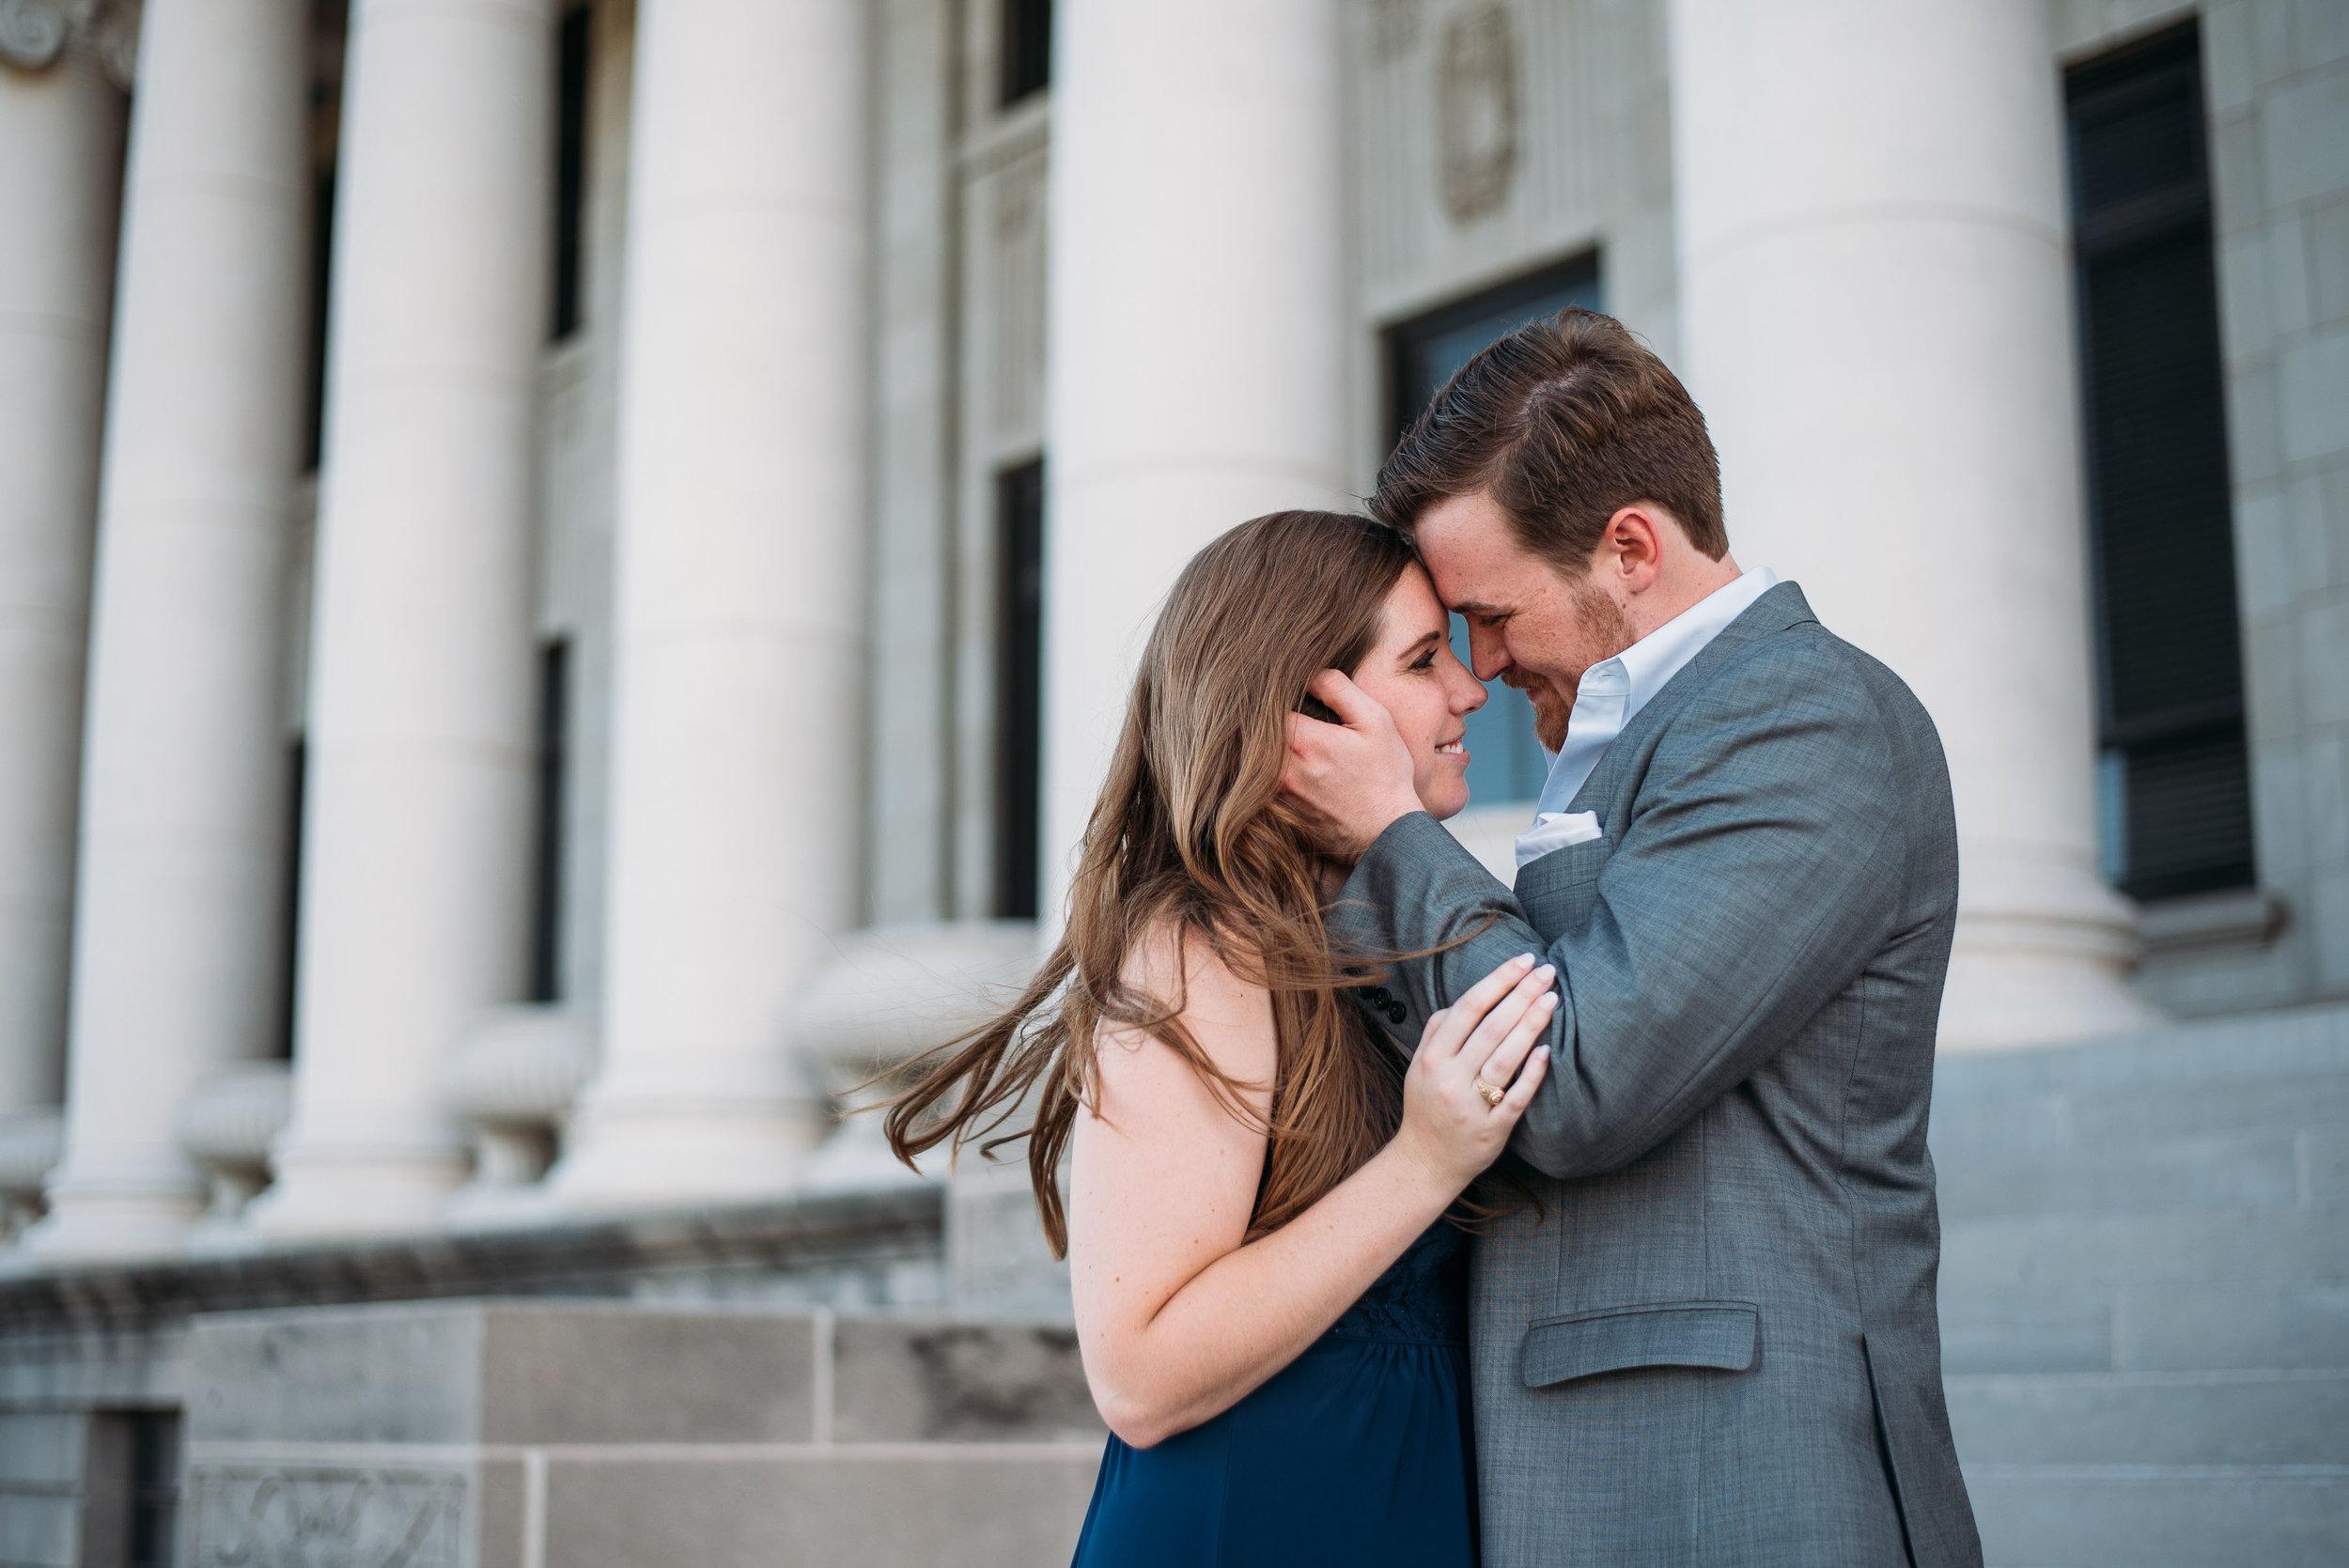 Texas-A&M-University-Engagement-College-Station-Wedding-Photographer-San-Angel-Photo-Mark-Johanna-Century-Tree-10.jpg